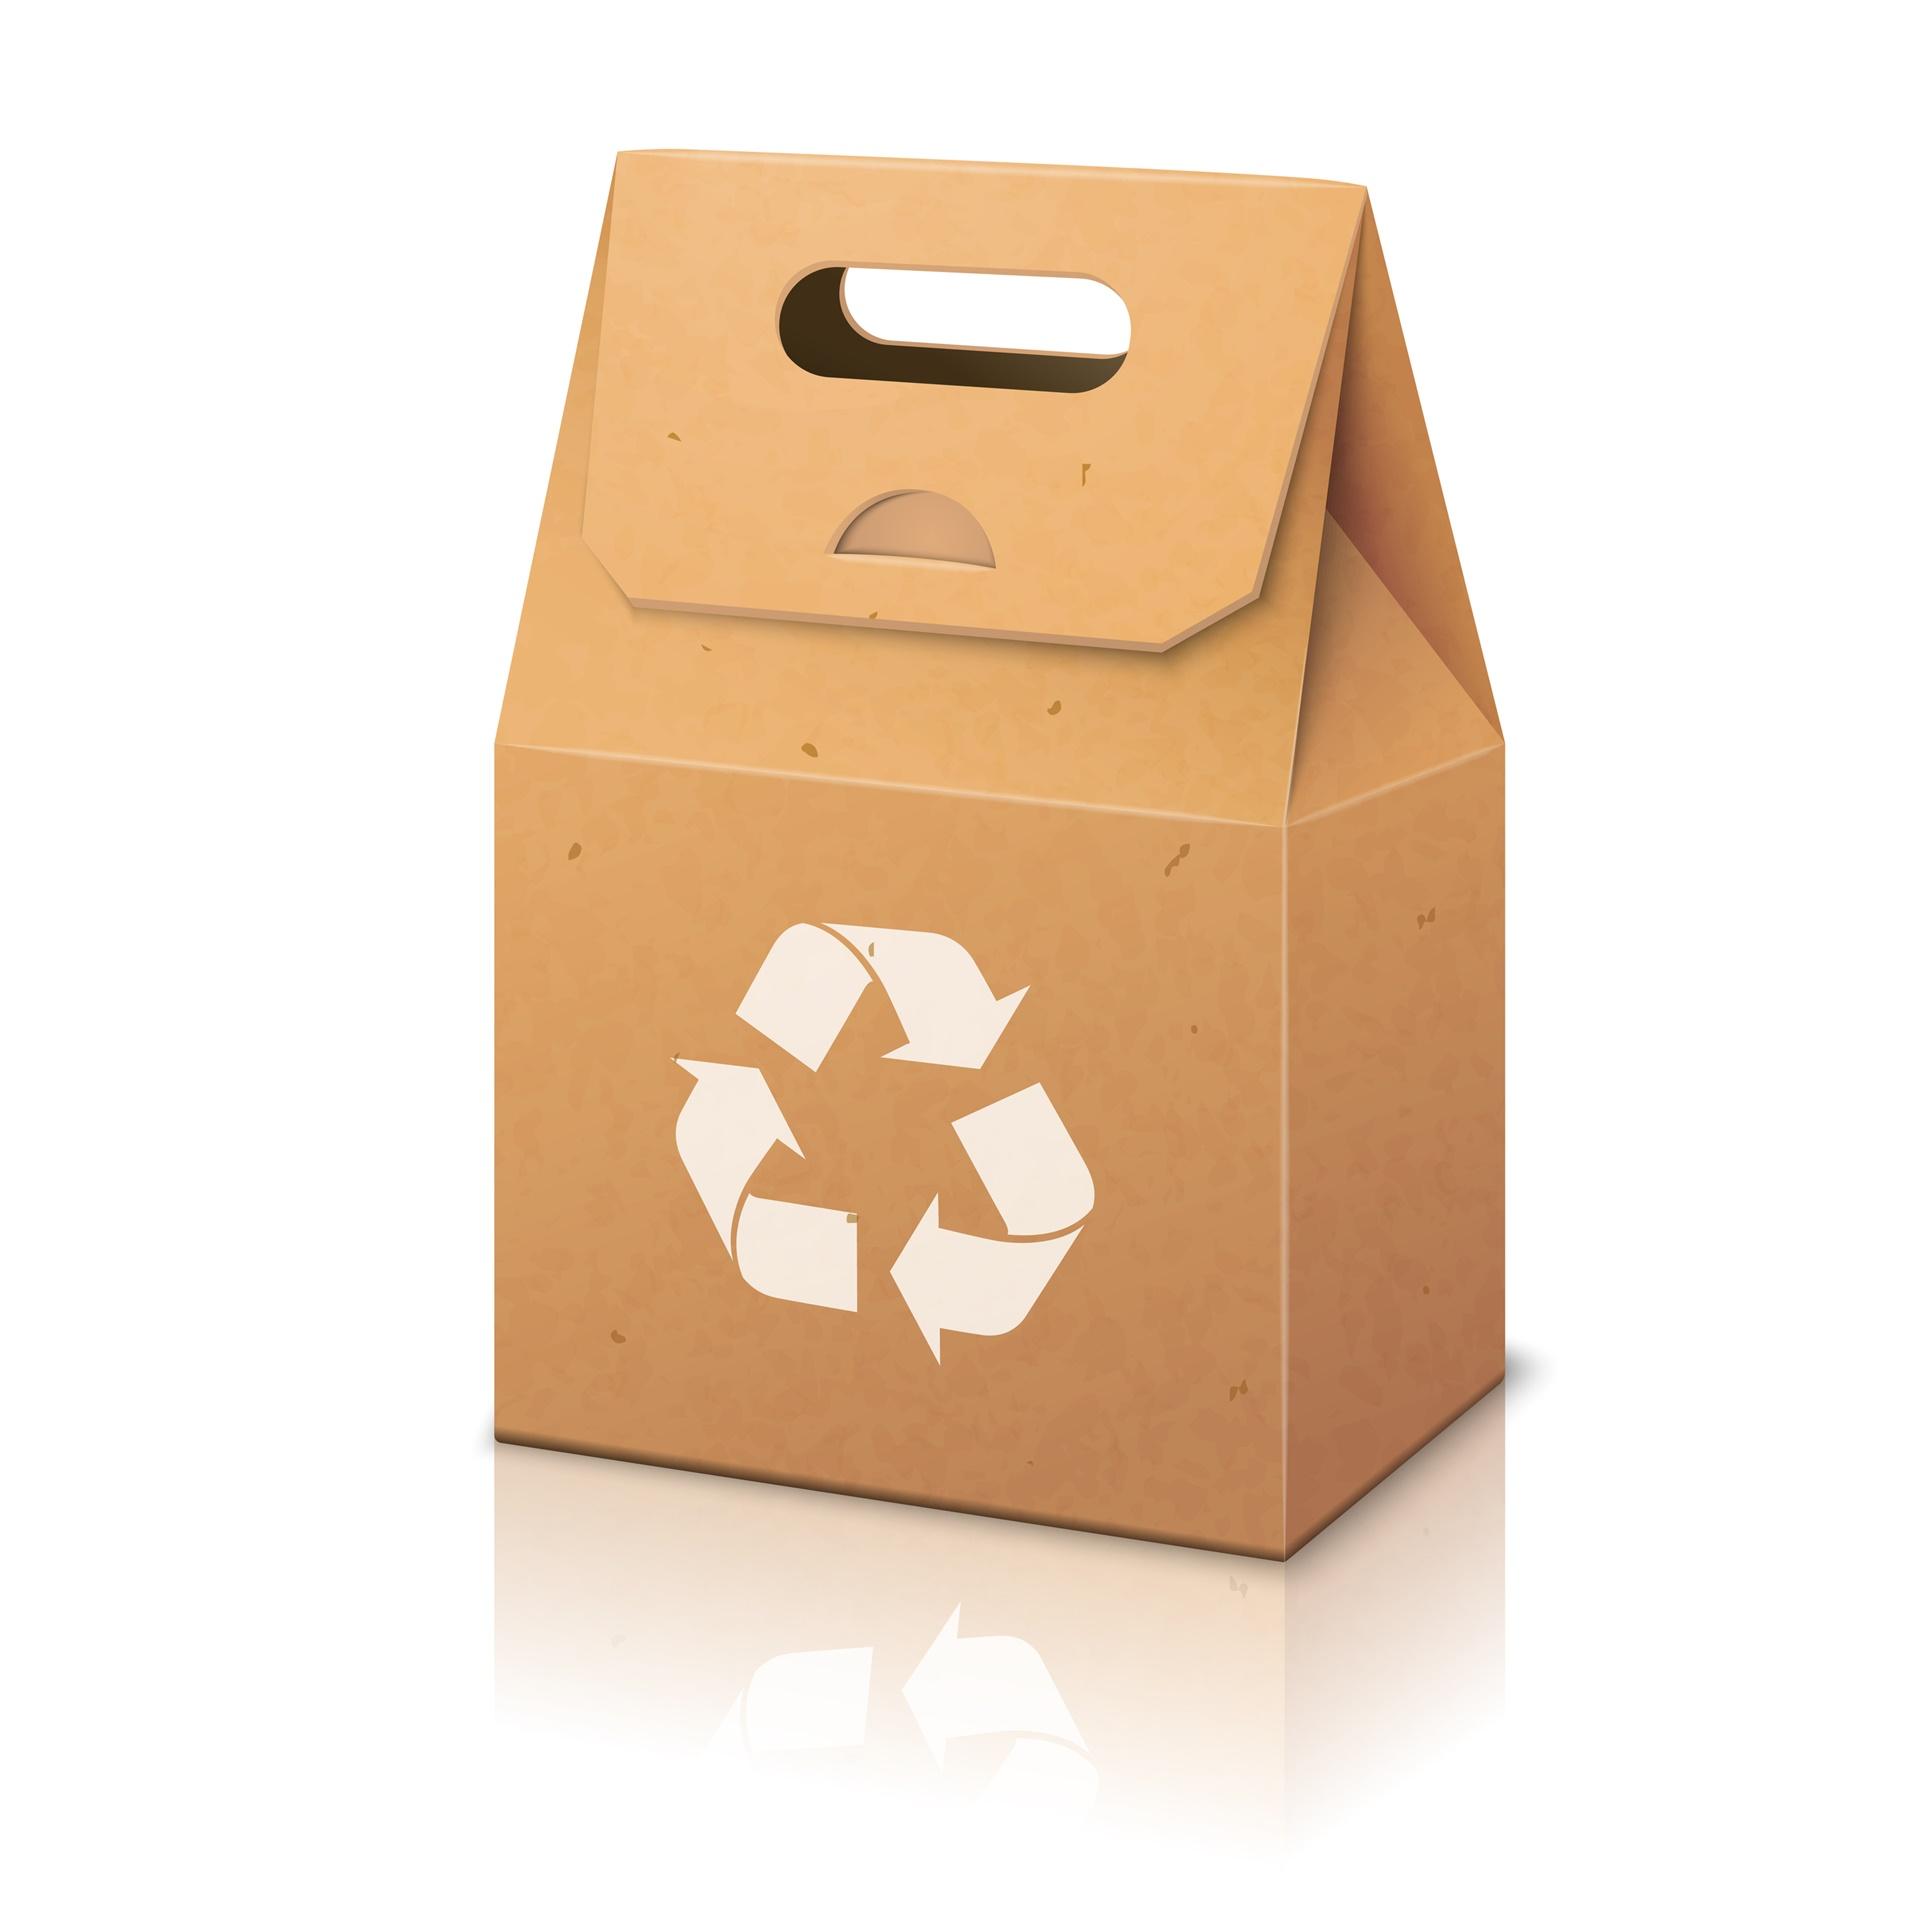 El uso del packaging biodegradable